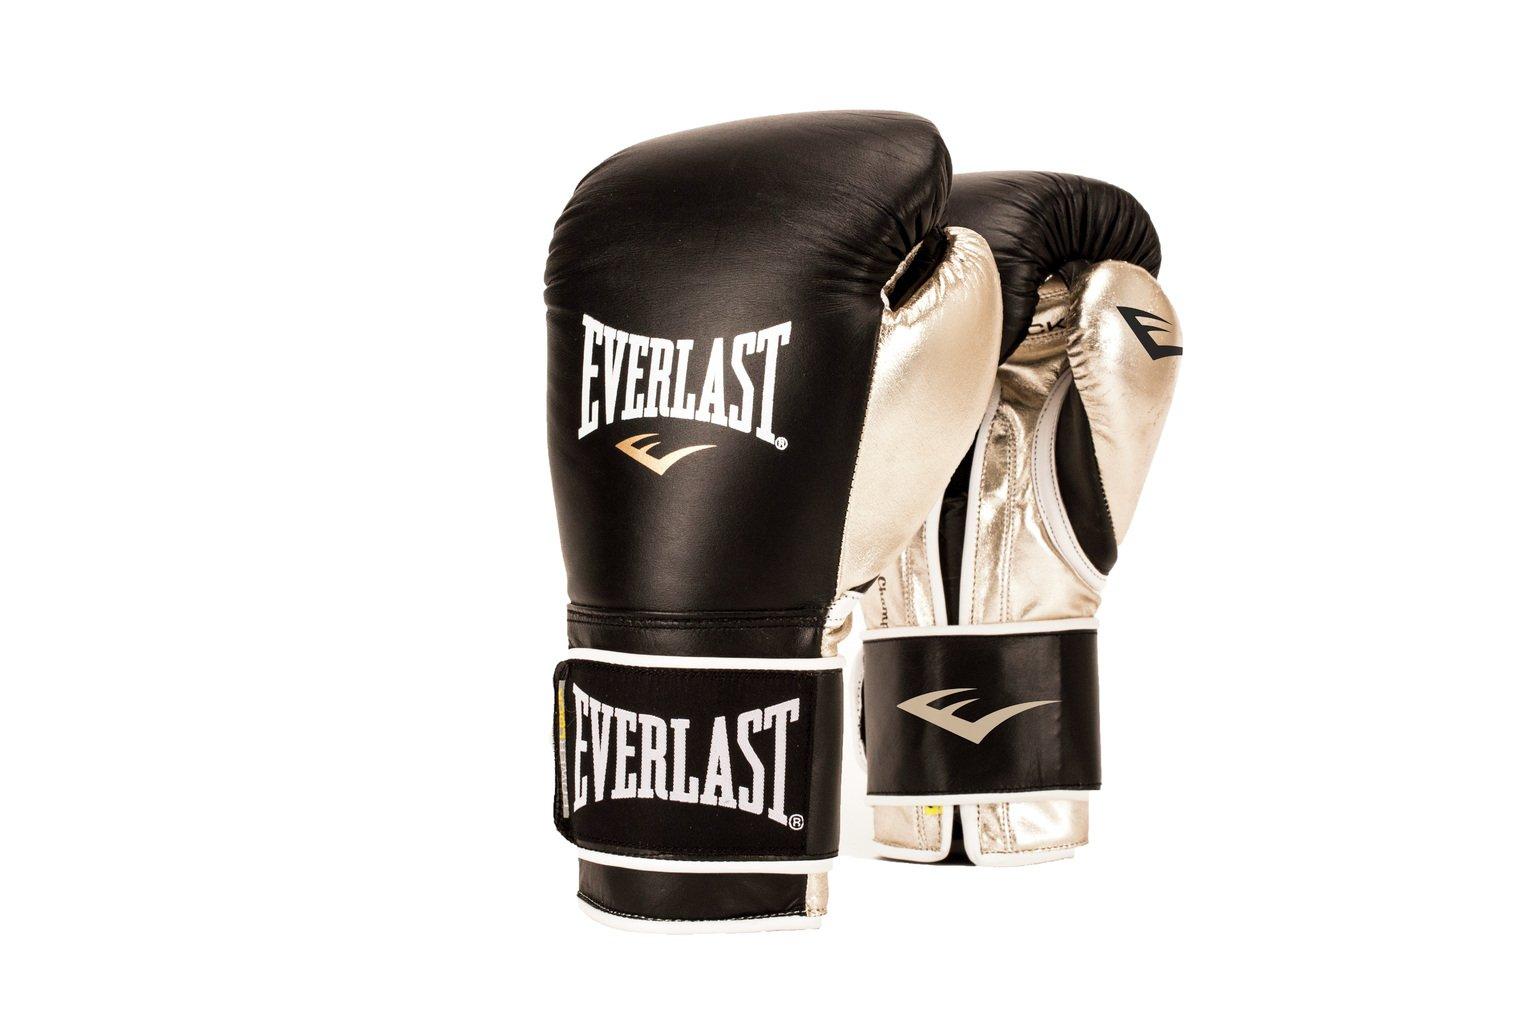 Everlast 16oz Powerlock Boxing Gloves